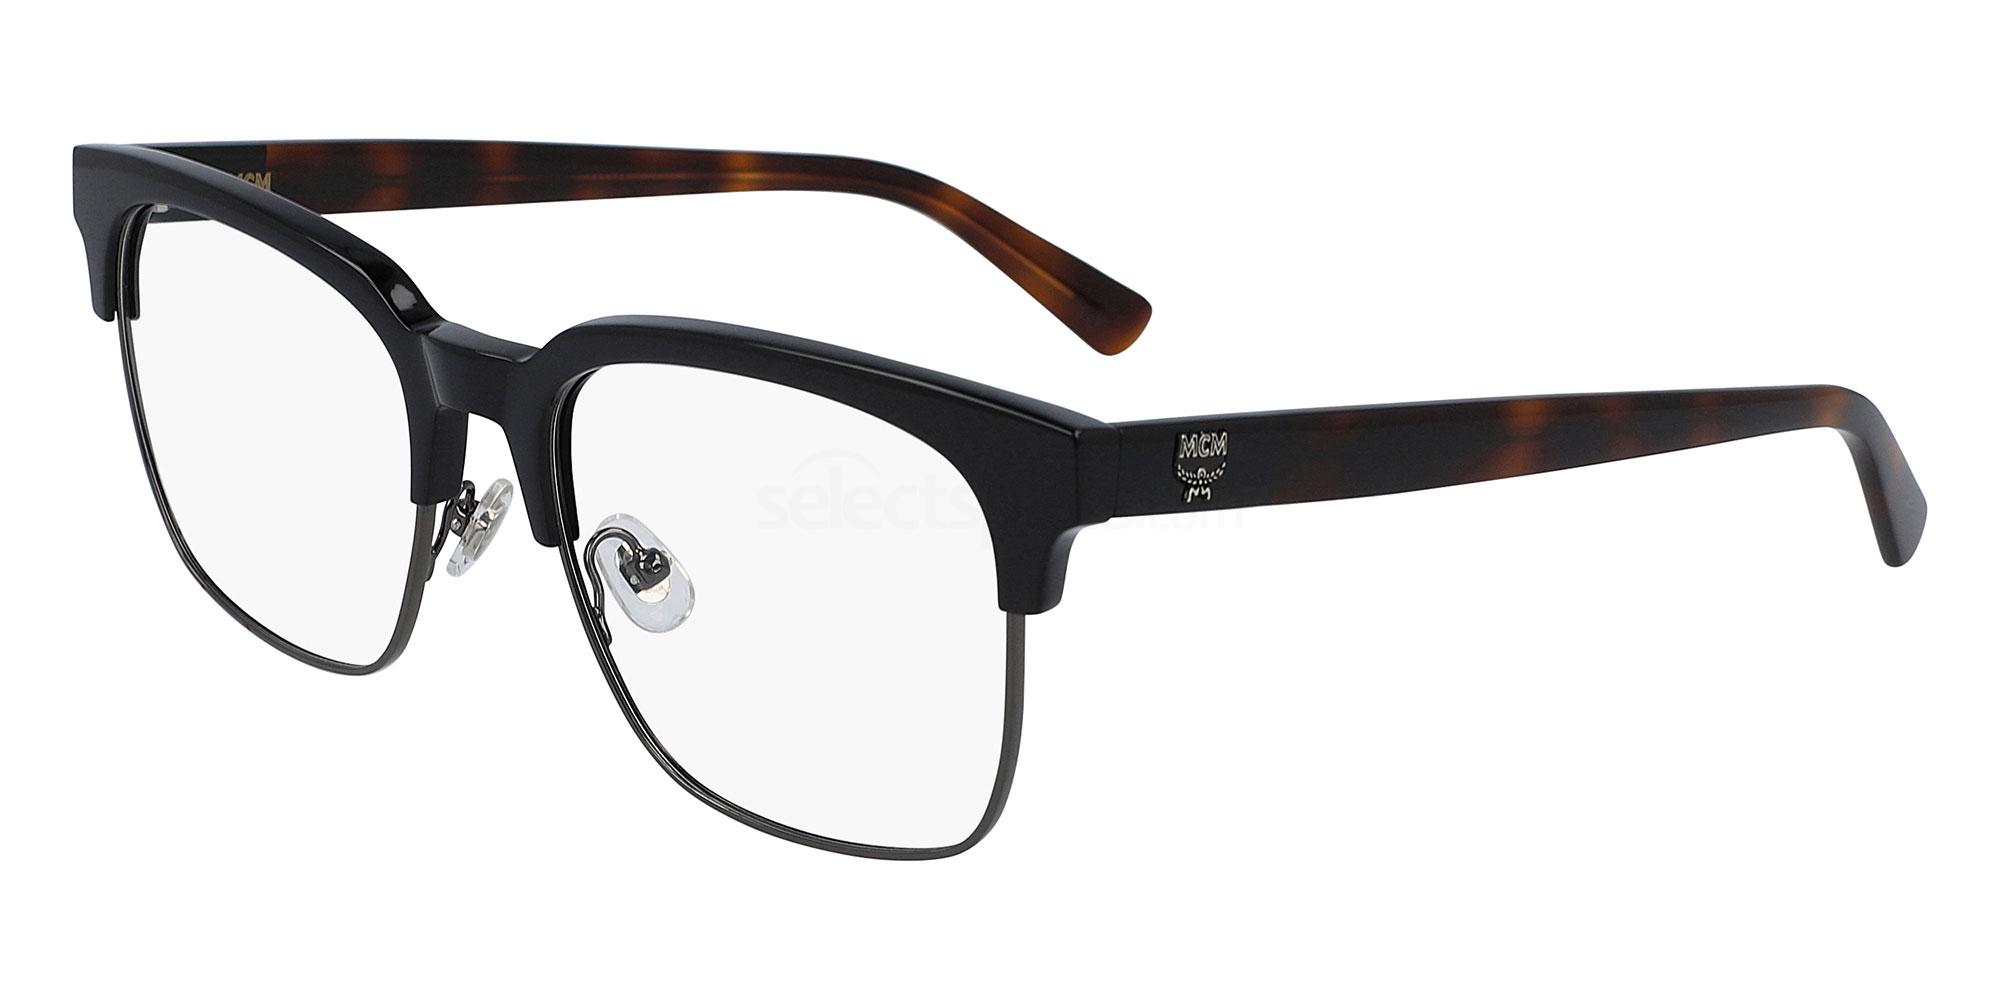 001 MCM2697 Glasses, MCM